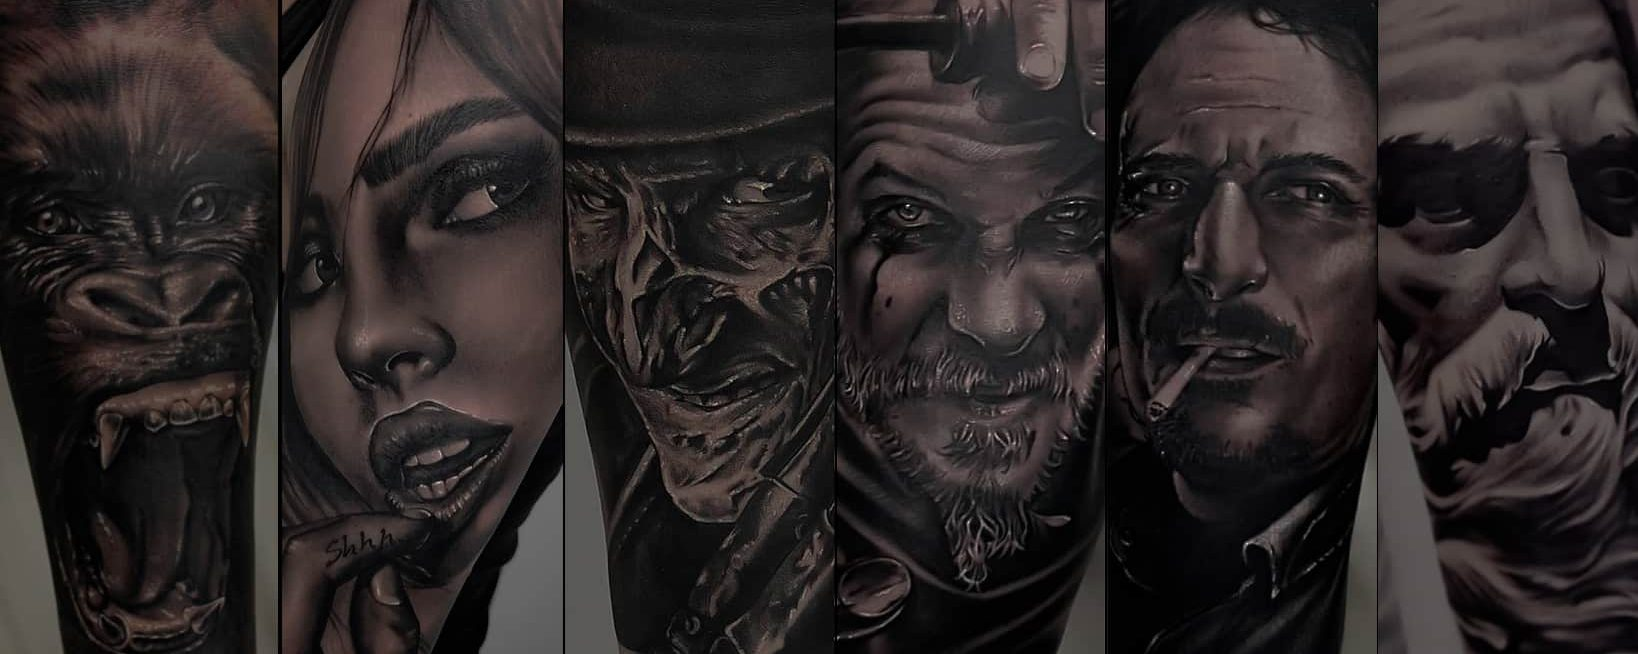 Steel Of Doom Tattoo Barcelona